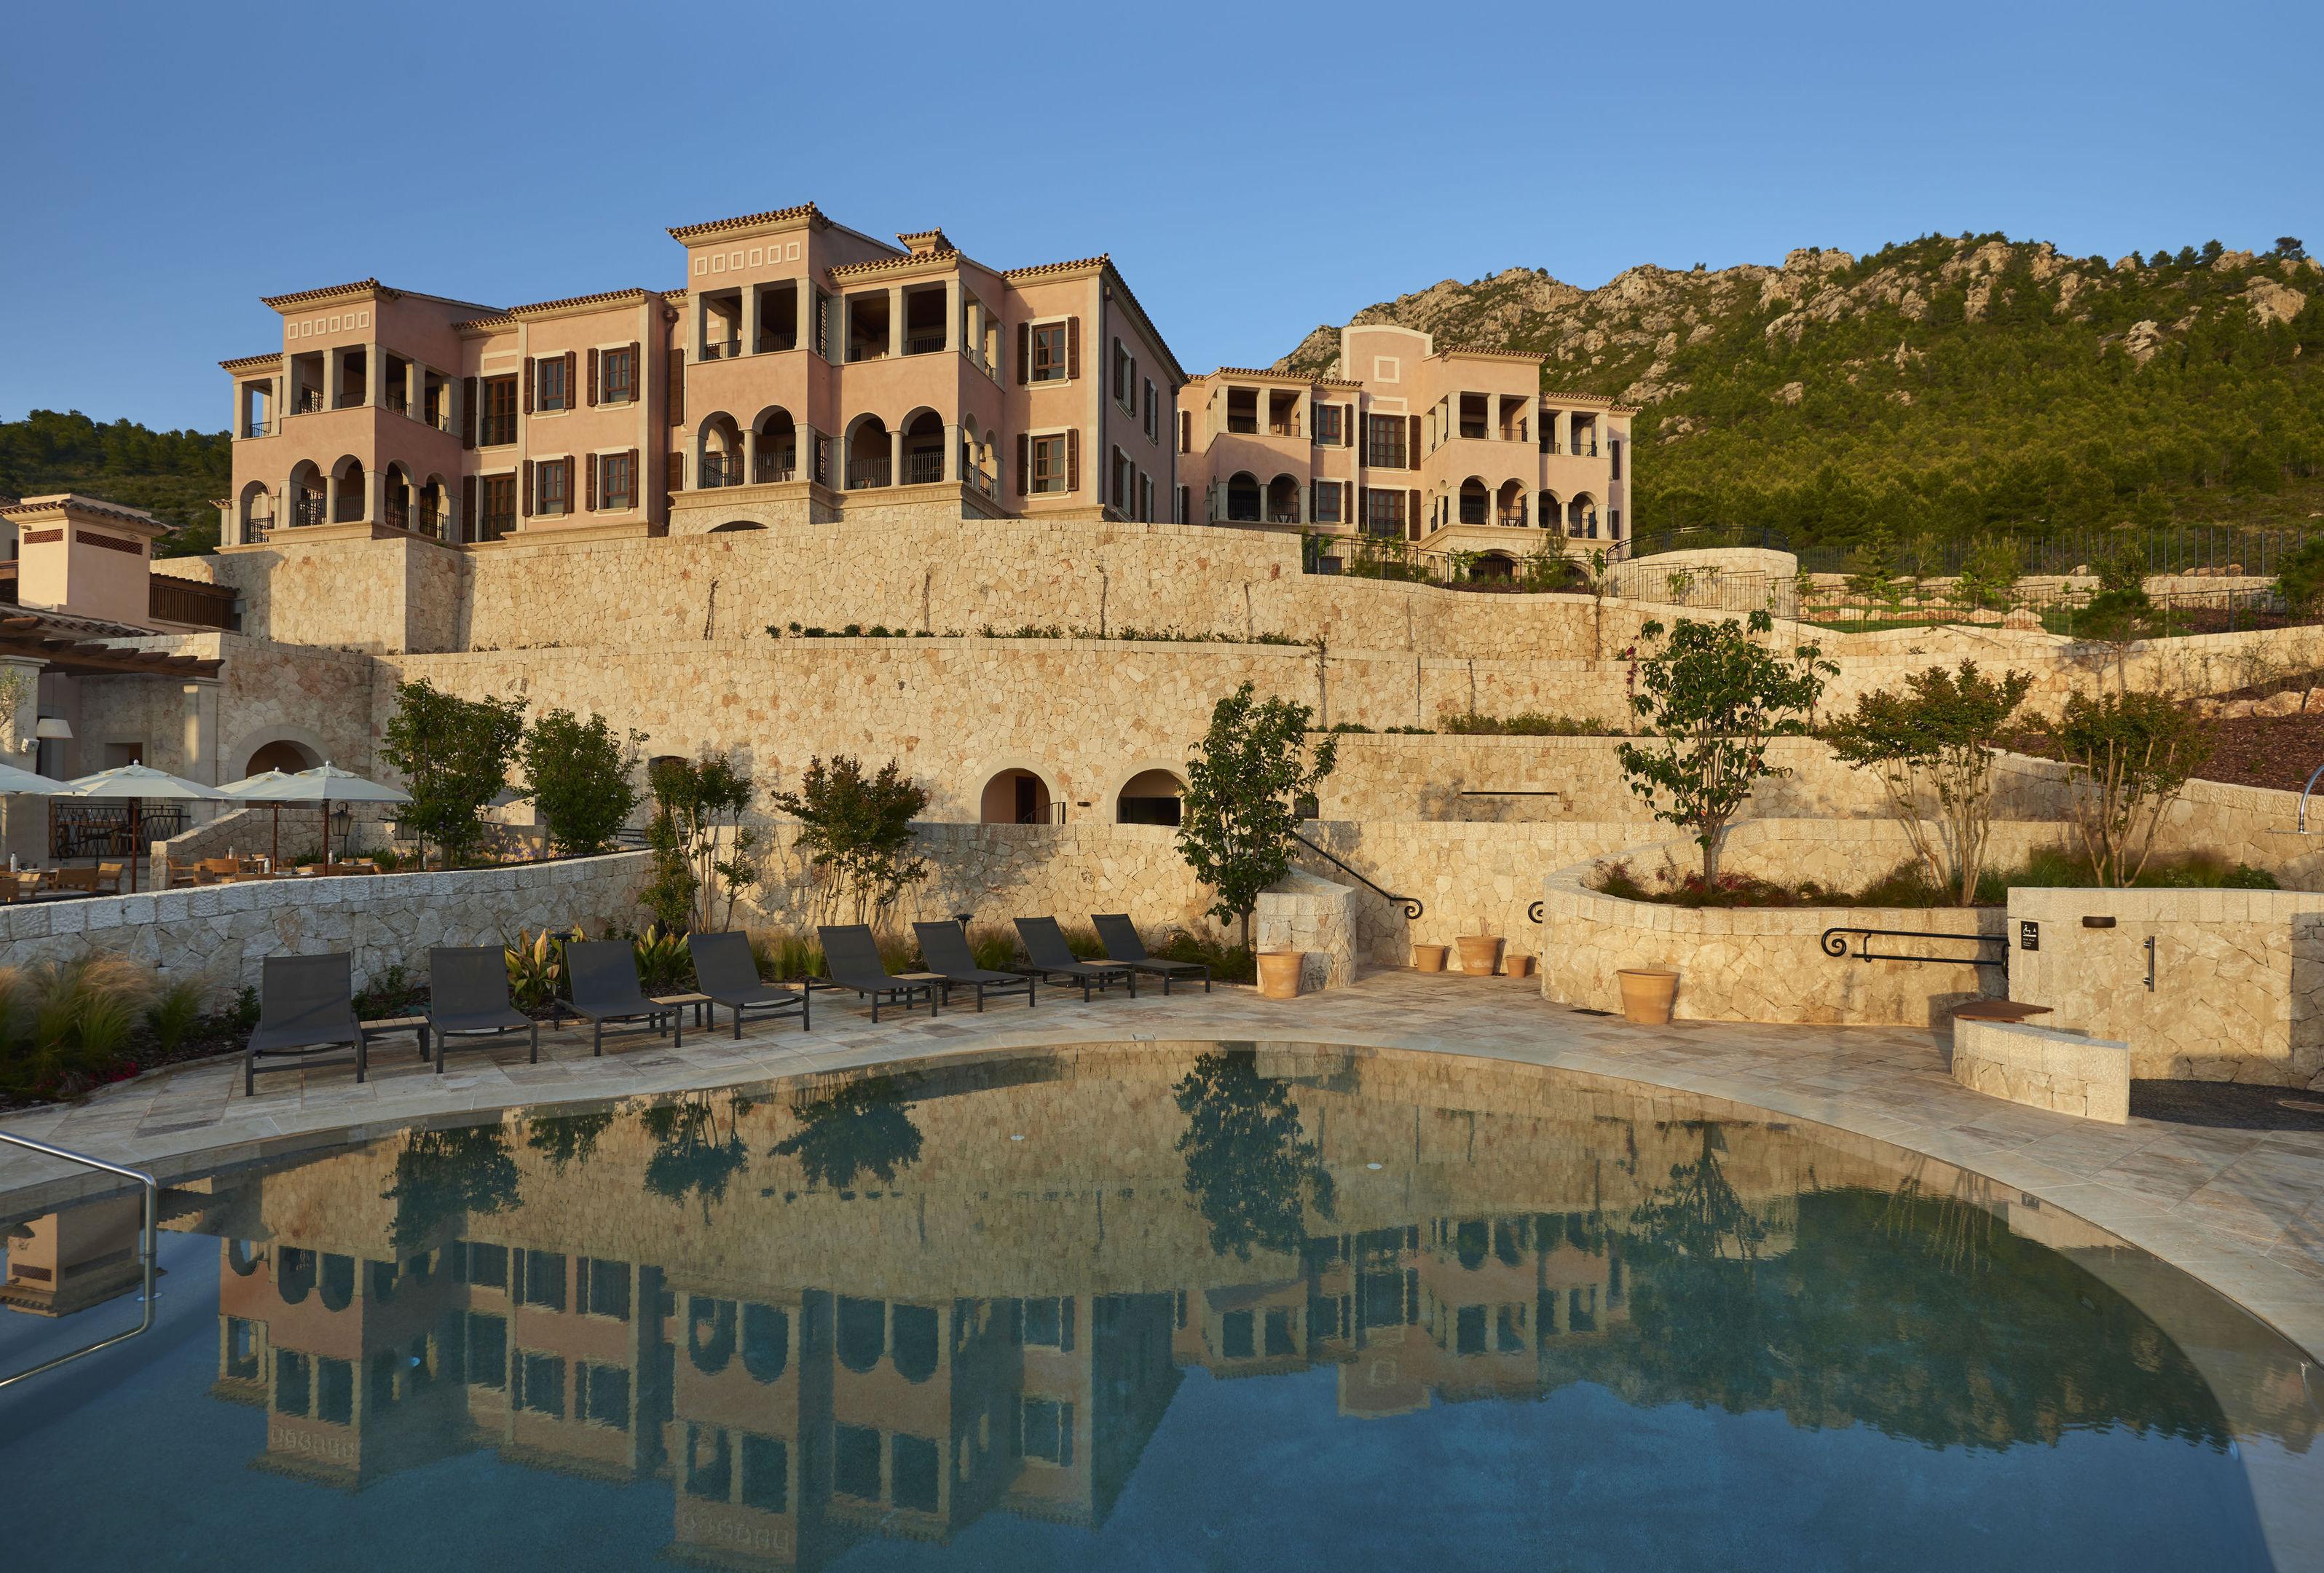 Exterior of the Park Hyatt, Mallorca.